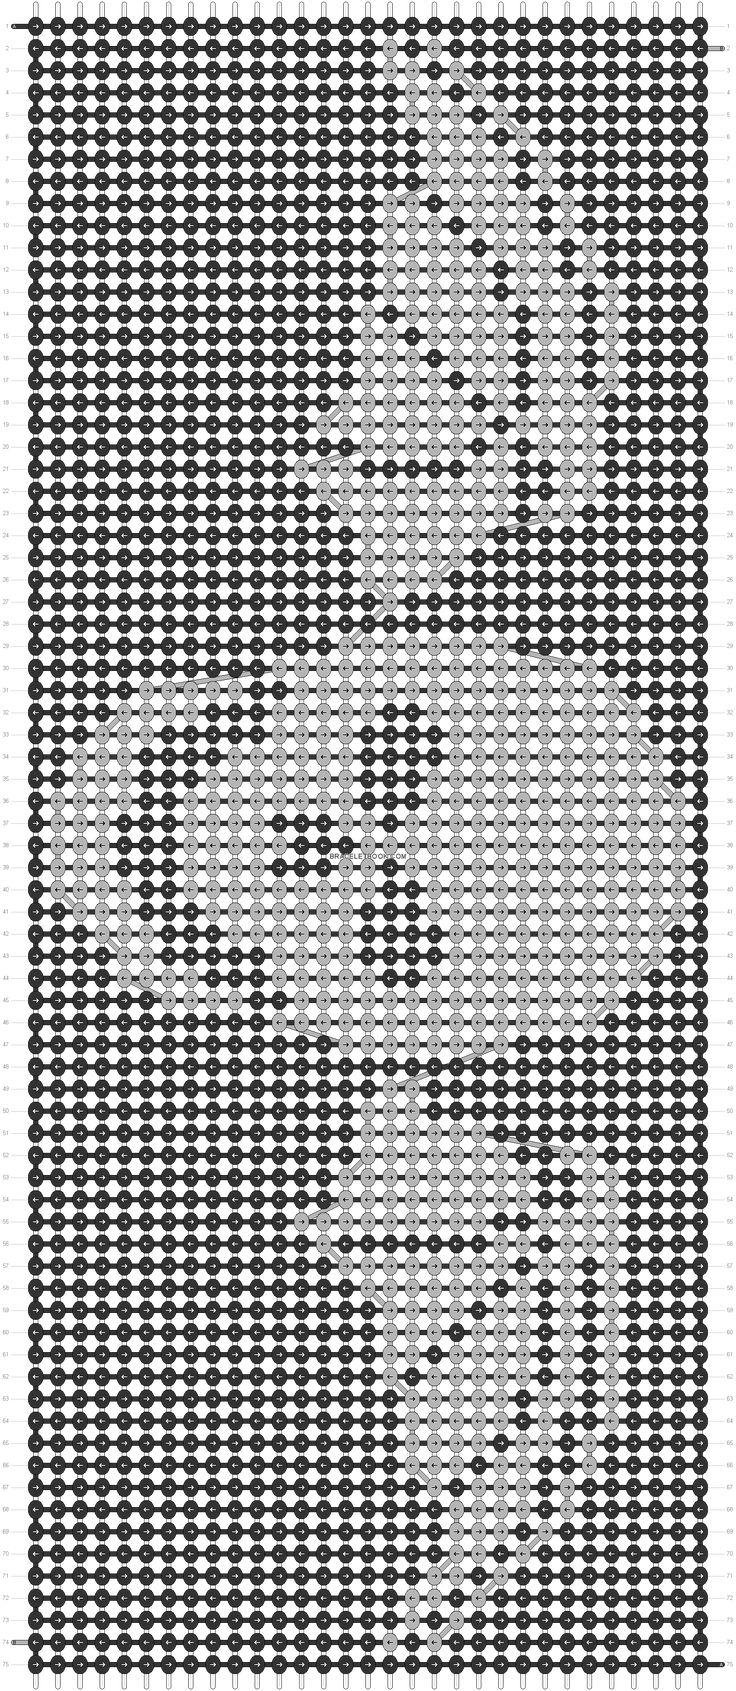 Alpha Pattern #17856 added by wolf3